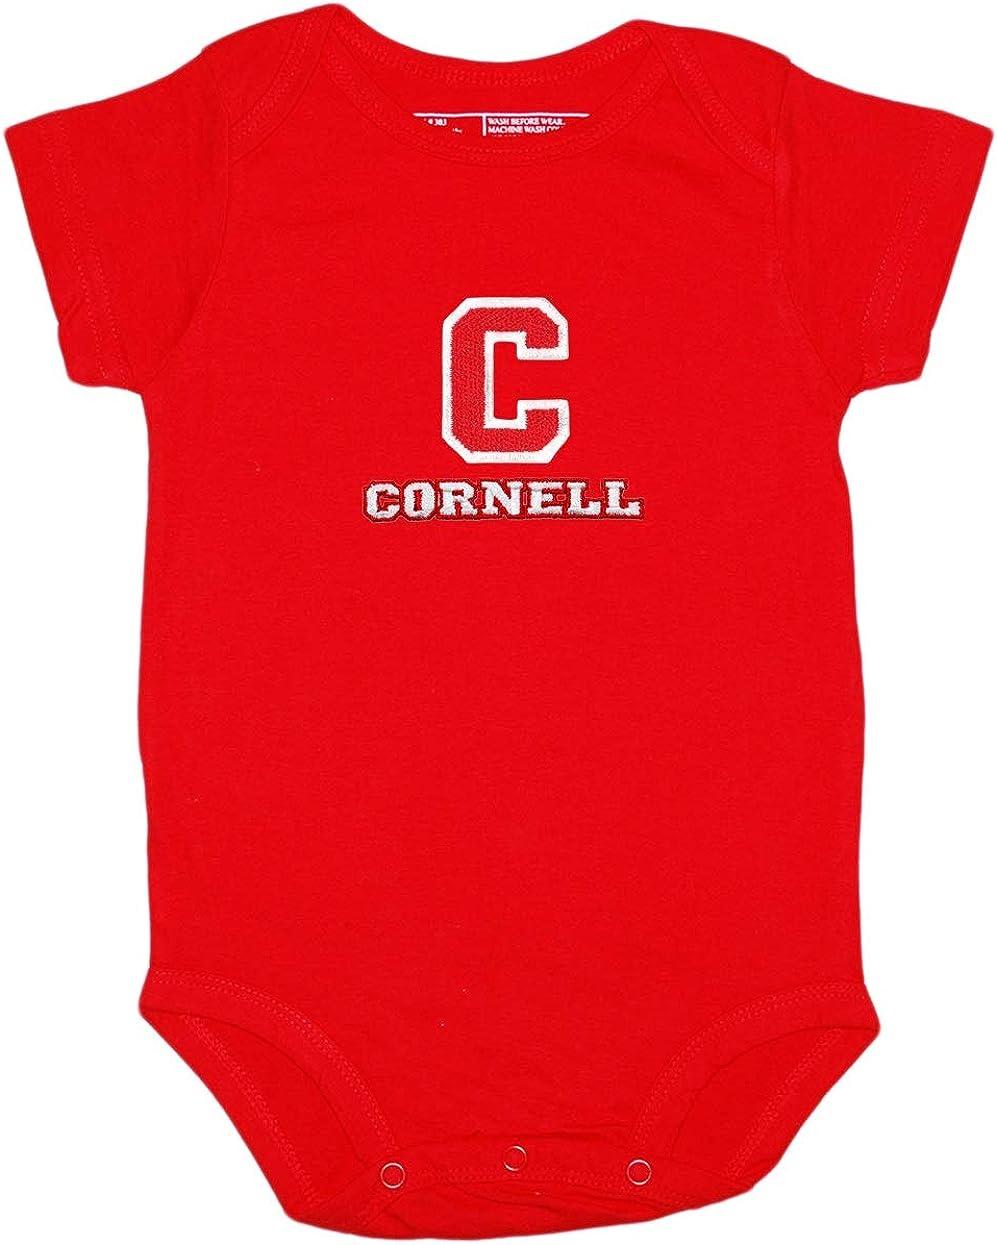 Creative Knitwear Cornell University Bears Baby and Toddler Polar Fleece Vest